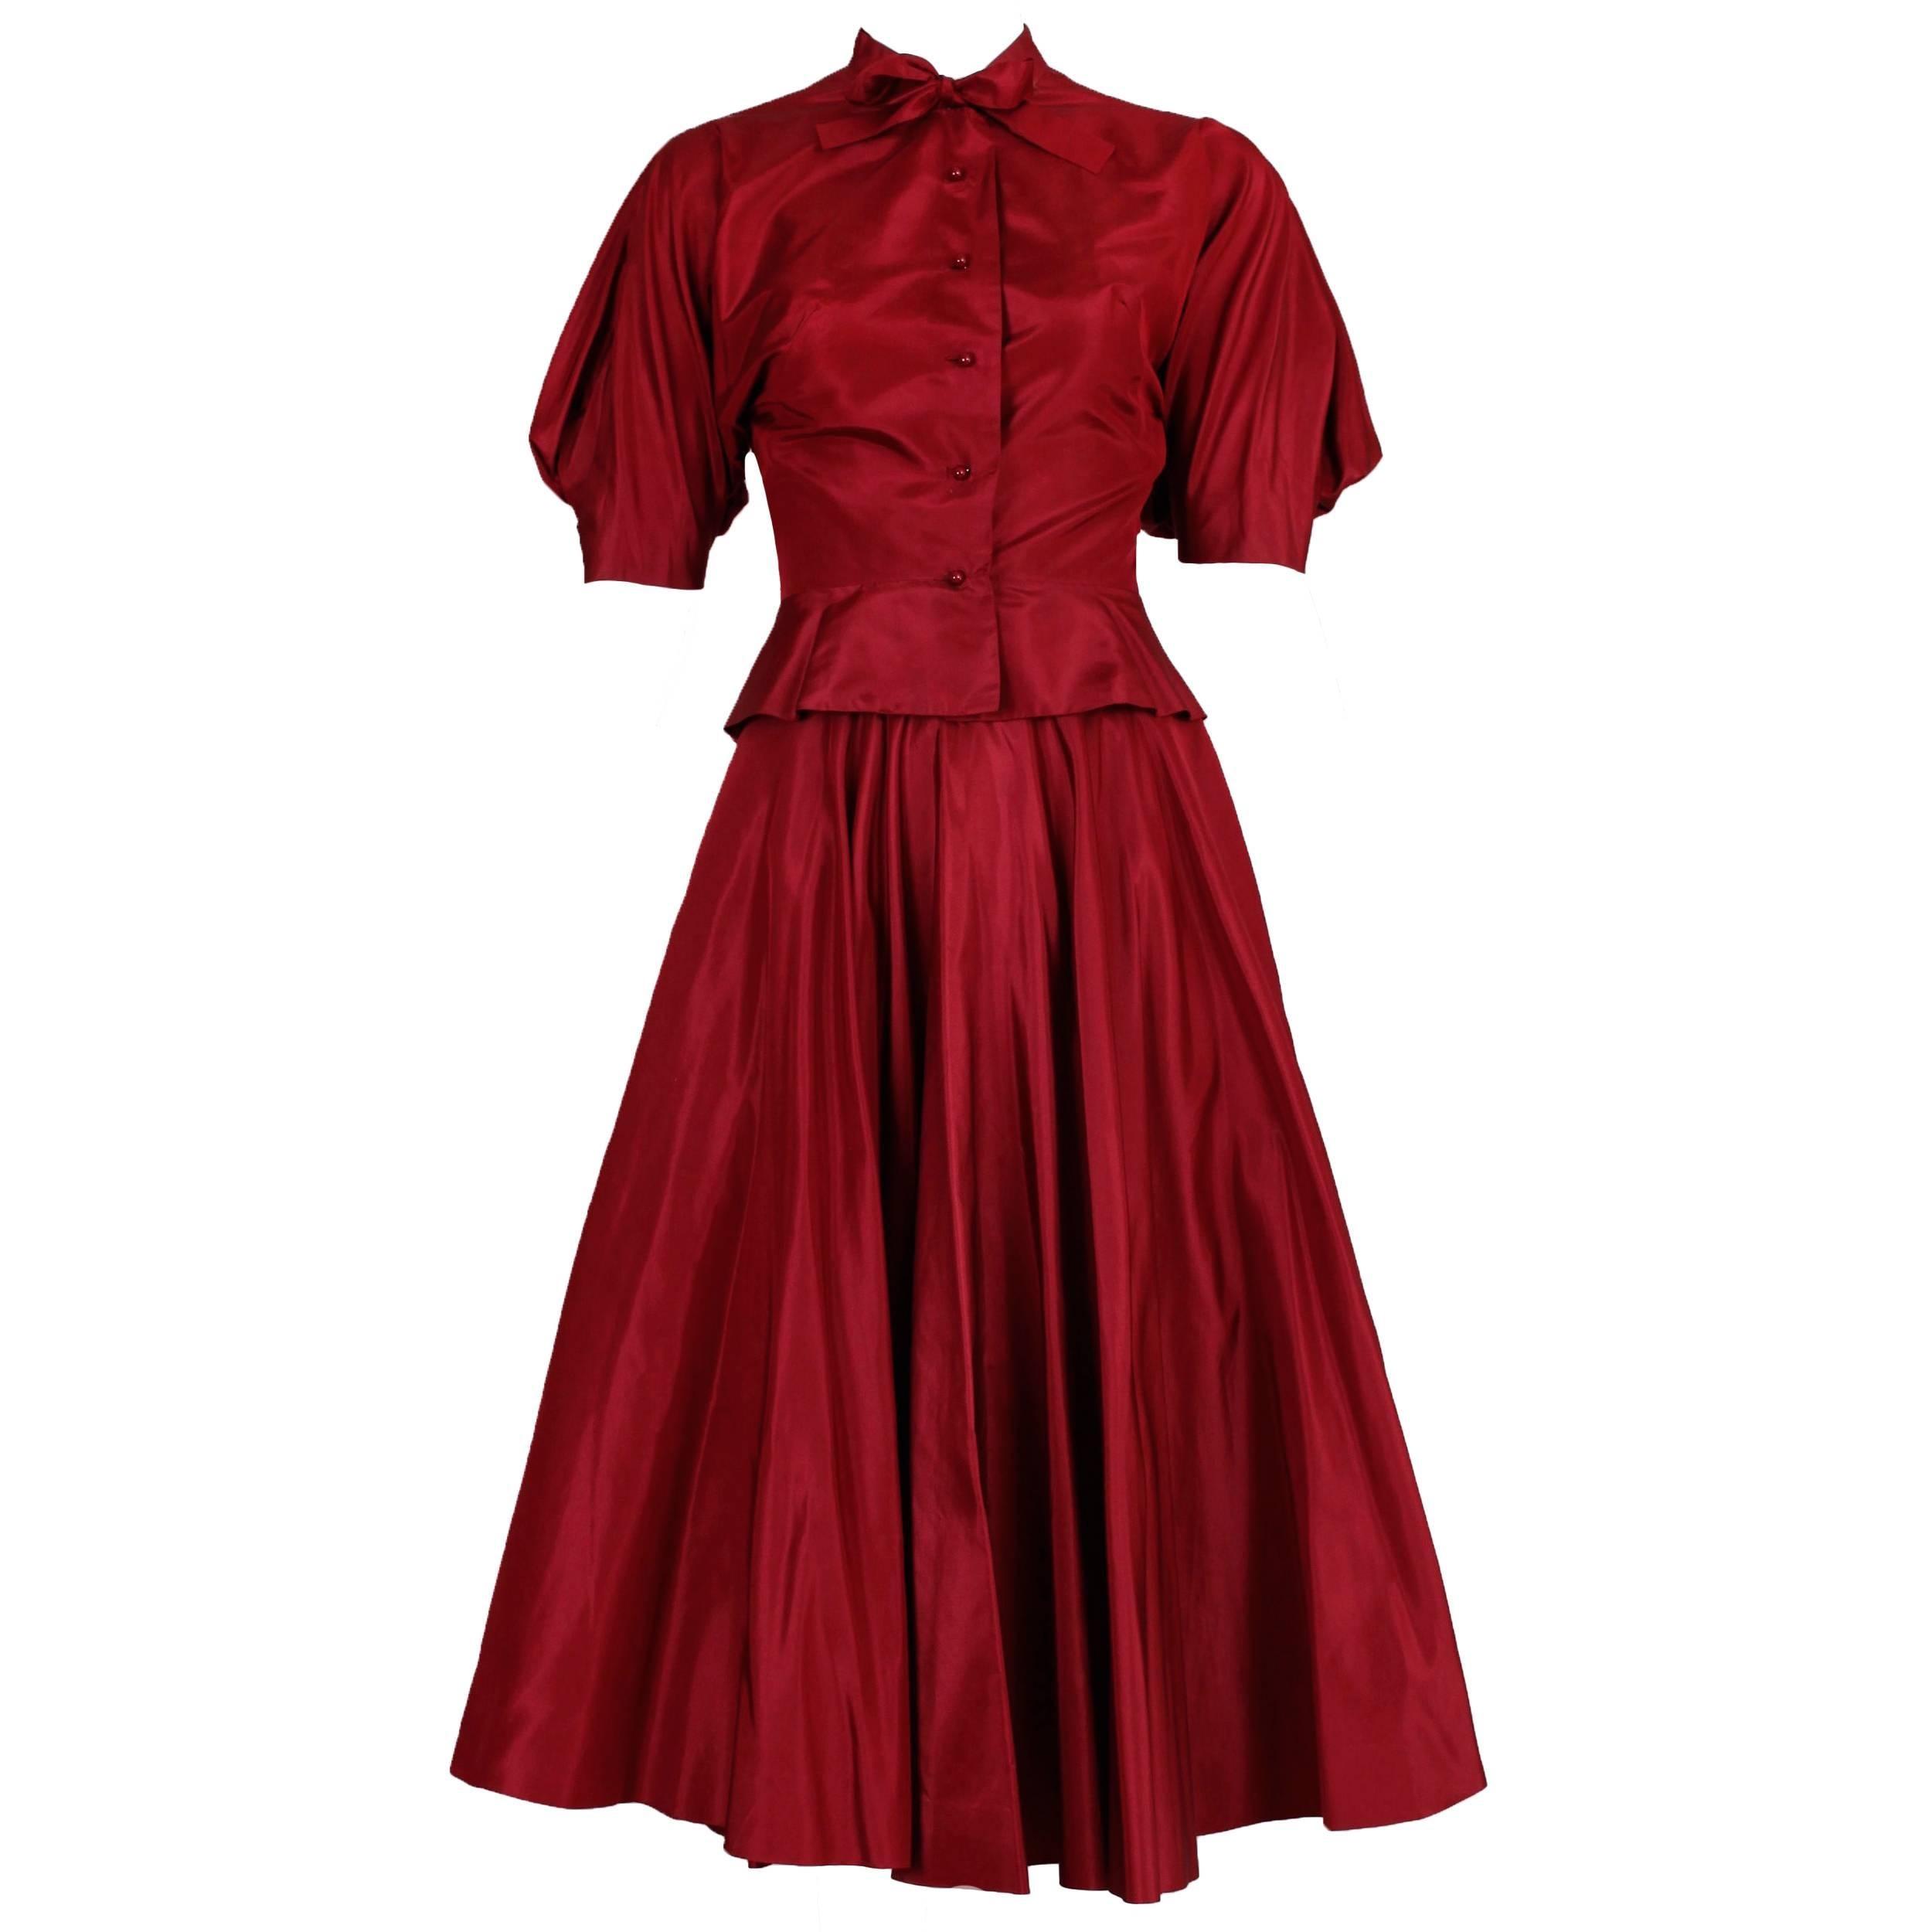 1981 Rare Madame Gres Haute Couture Silk Taffeta Skirt & Blouse Ensemble w/Shoes